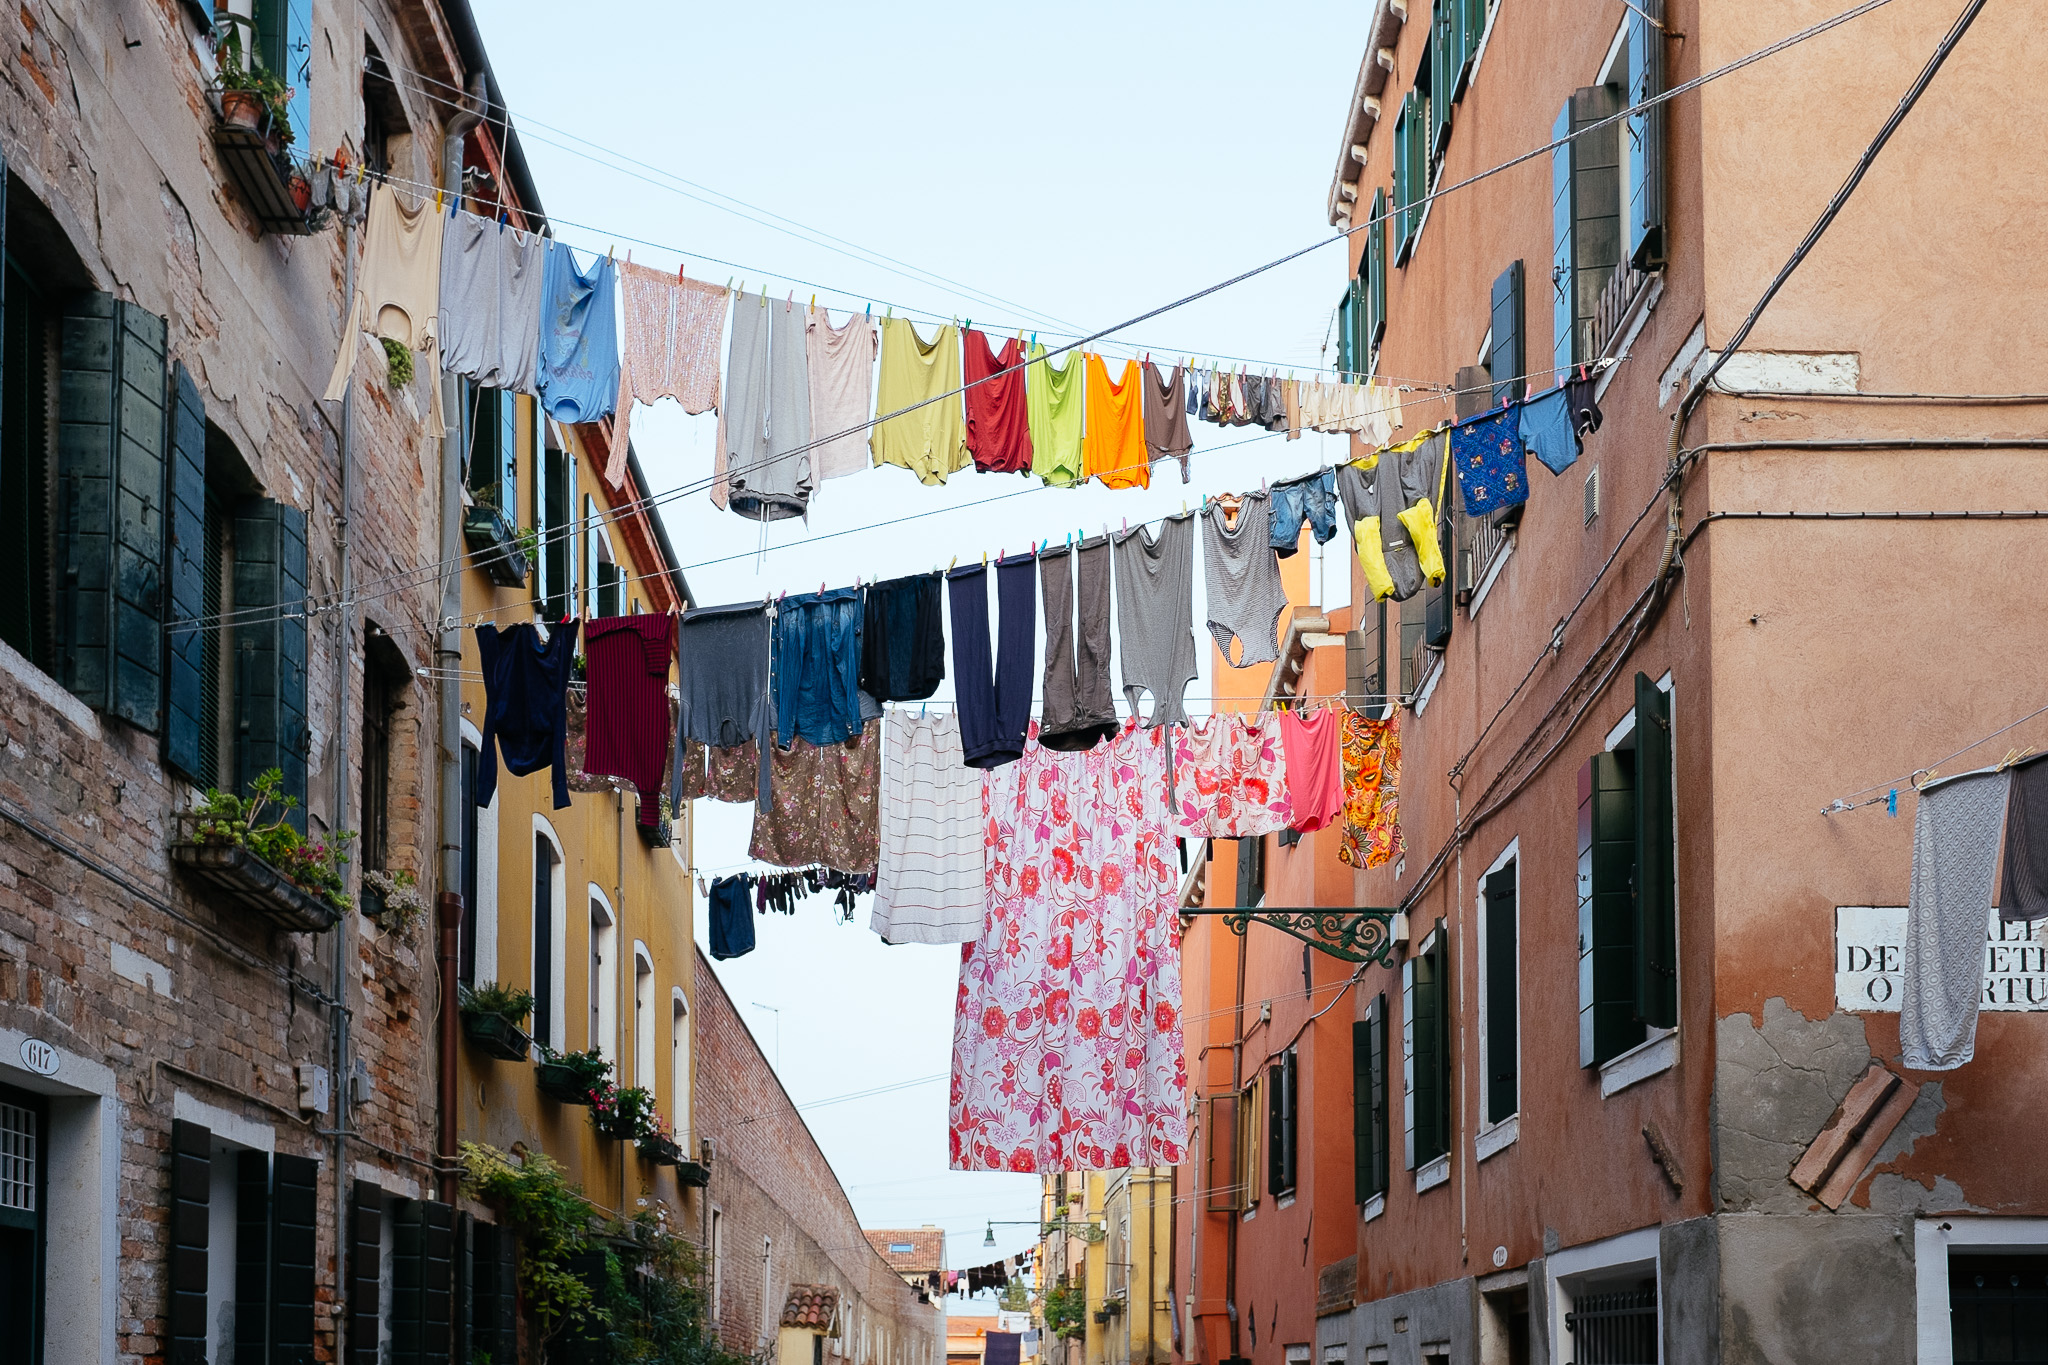 venice-washing-lines-7668